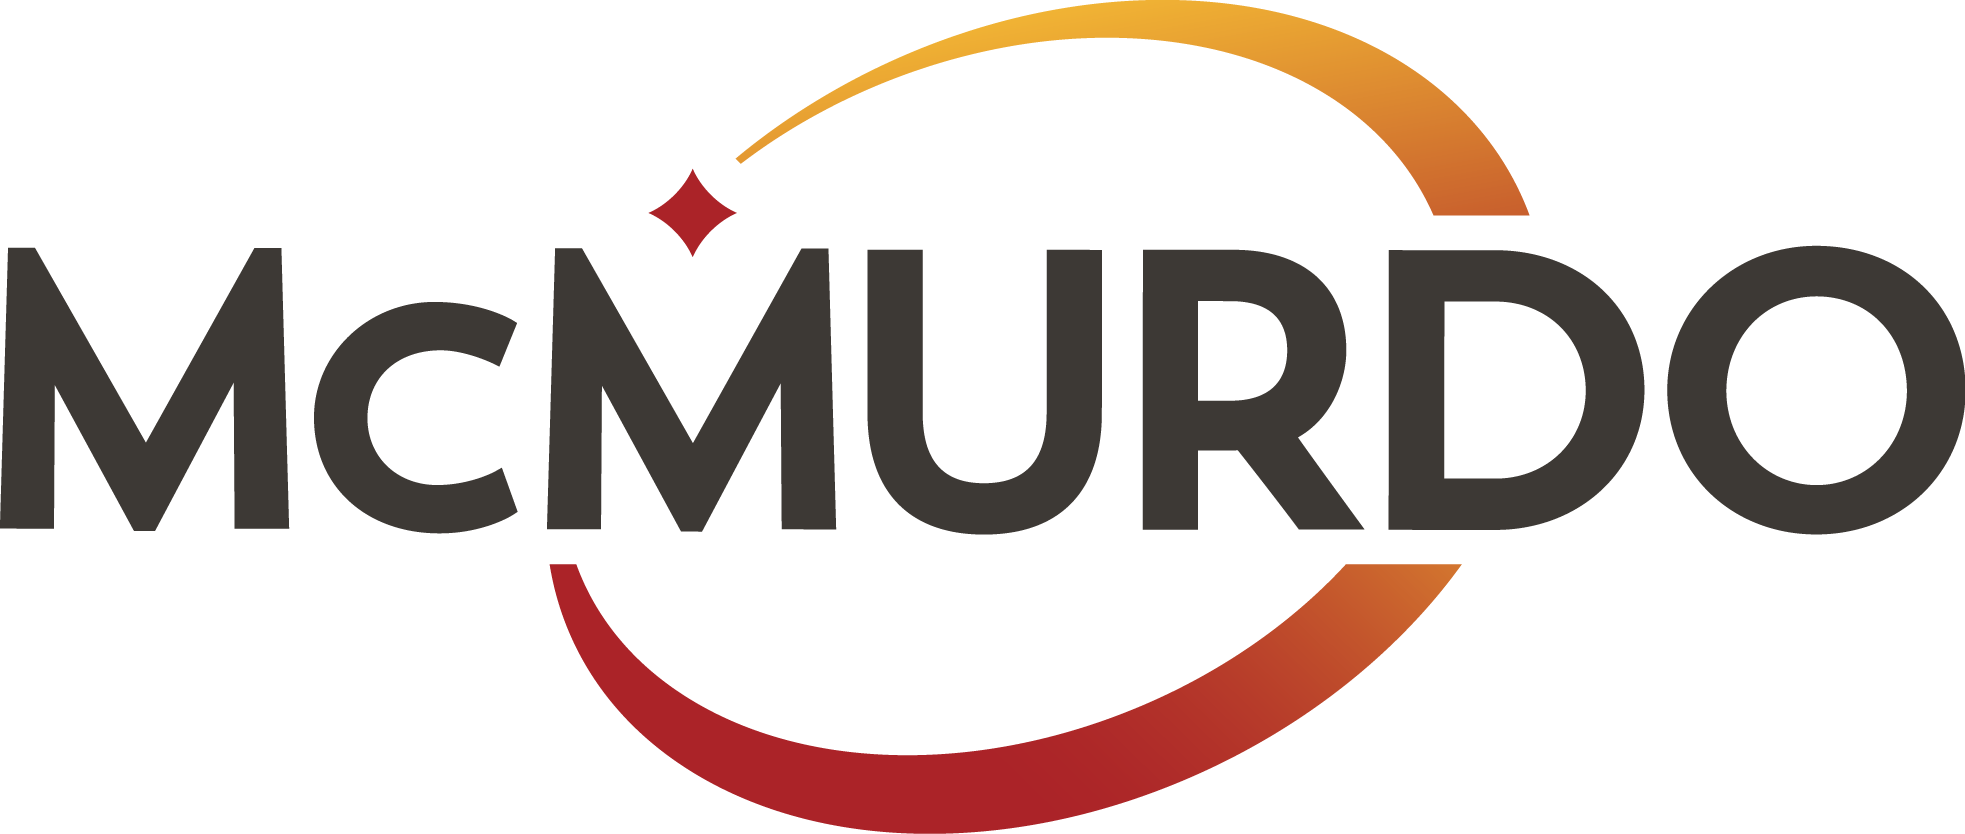 mcmurdo_logo_redesign_rgb